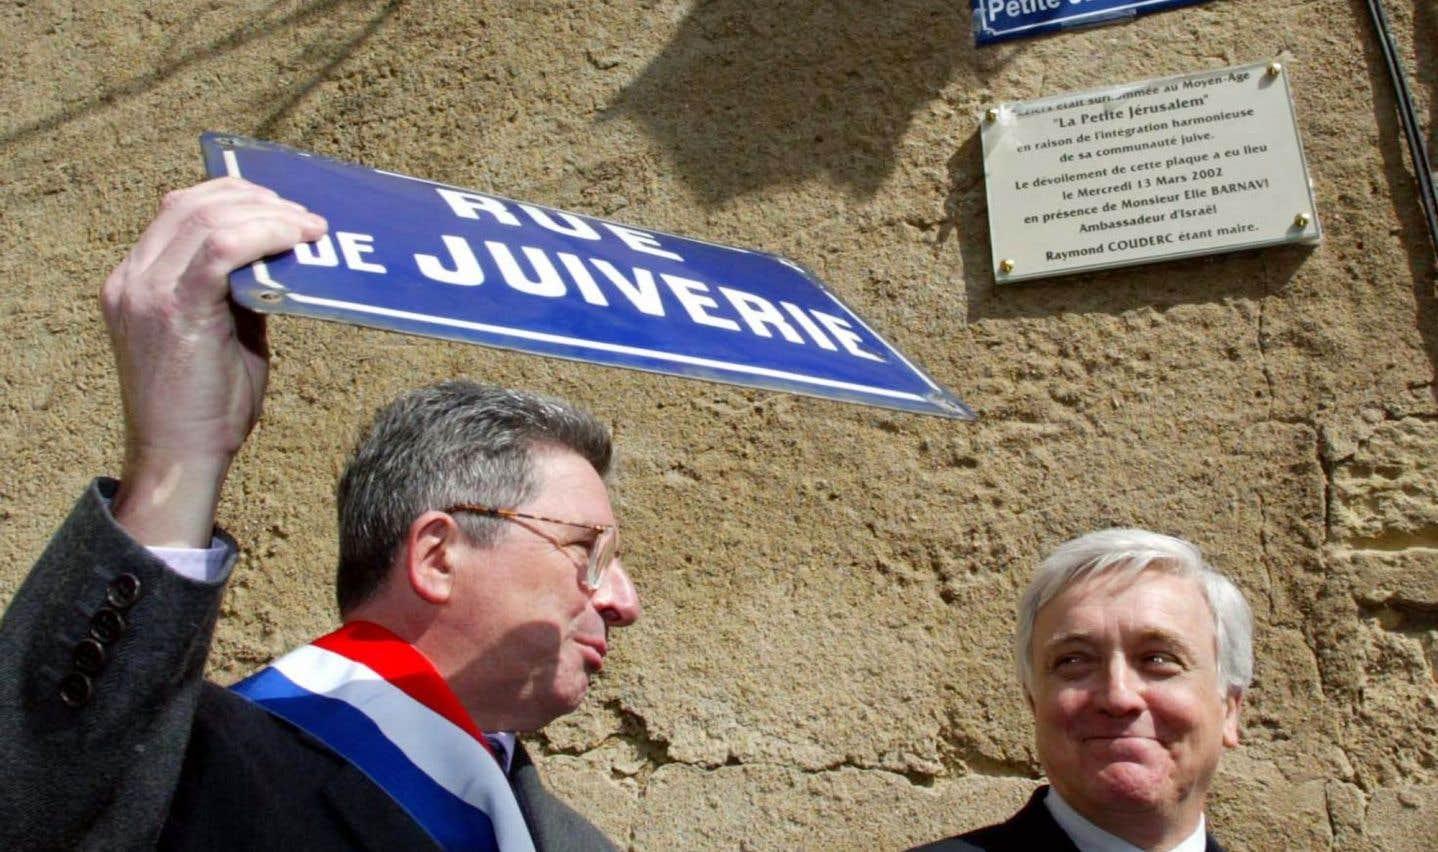 La France, championne de la toponymie